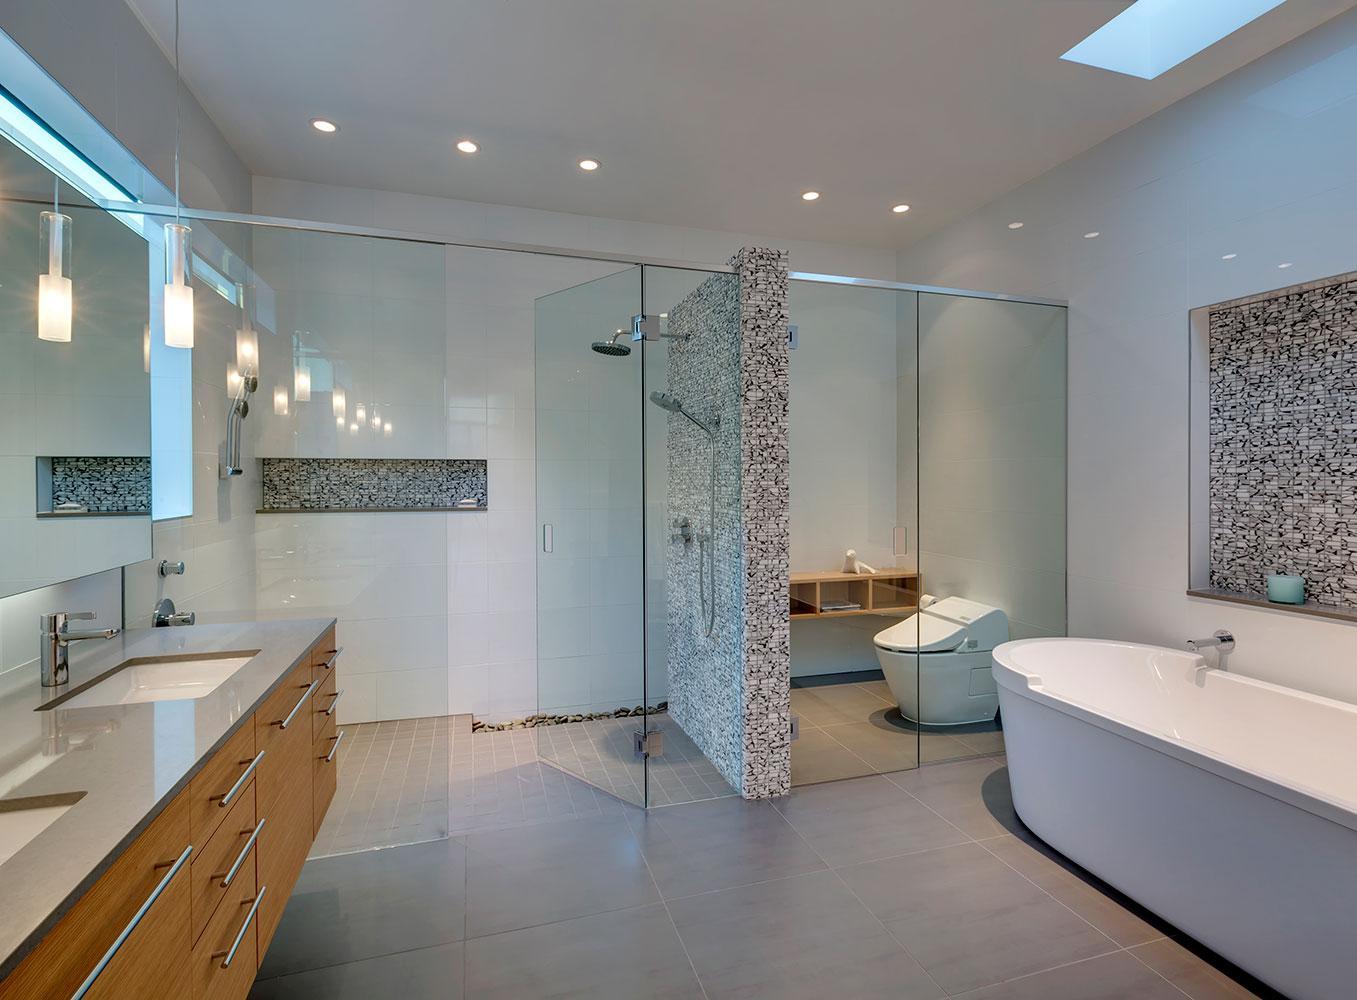 ... Il Granito, Horizon Italian Tile, Bury, Inc., Knoxtile, Mu0026M Design  Studio, SubZero Wolf, MESA, Westside Kitchen And Bath, Su0026H Design  Development